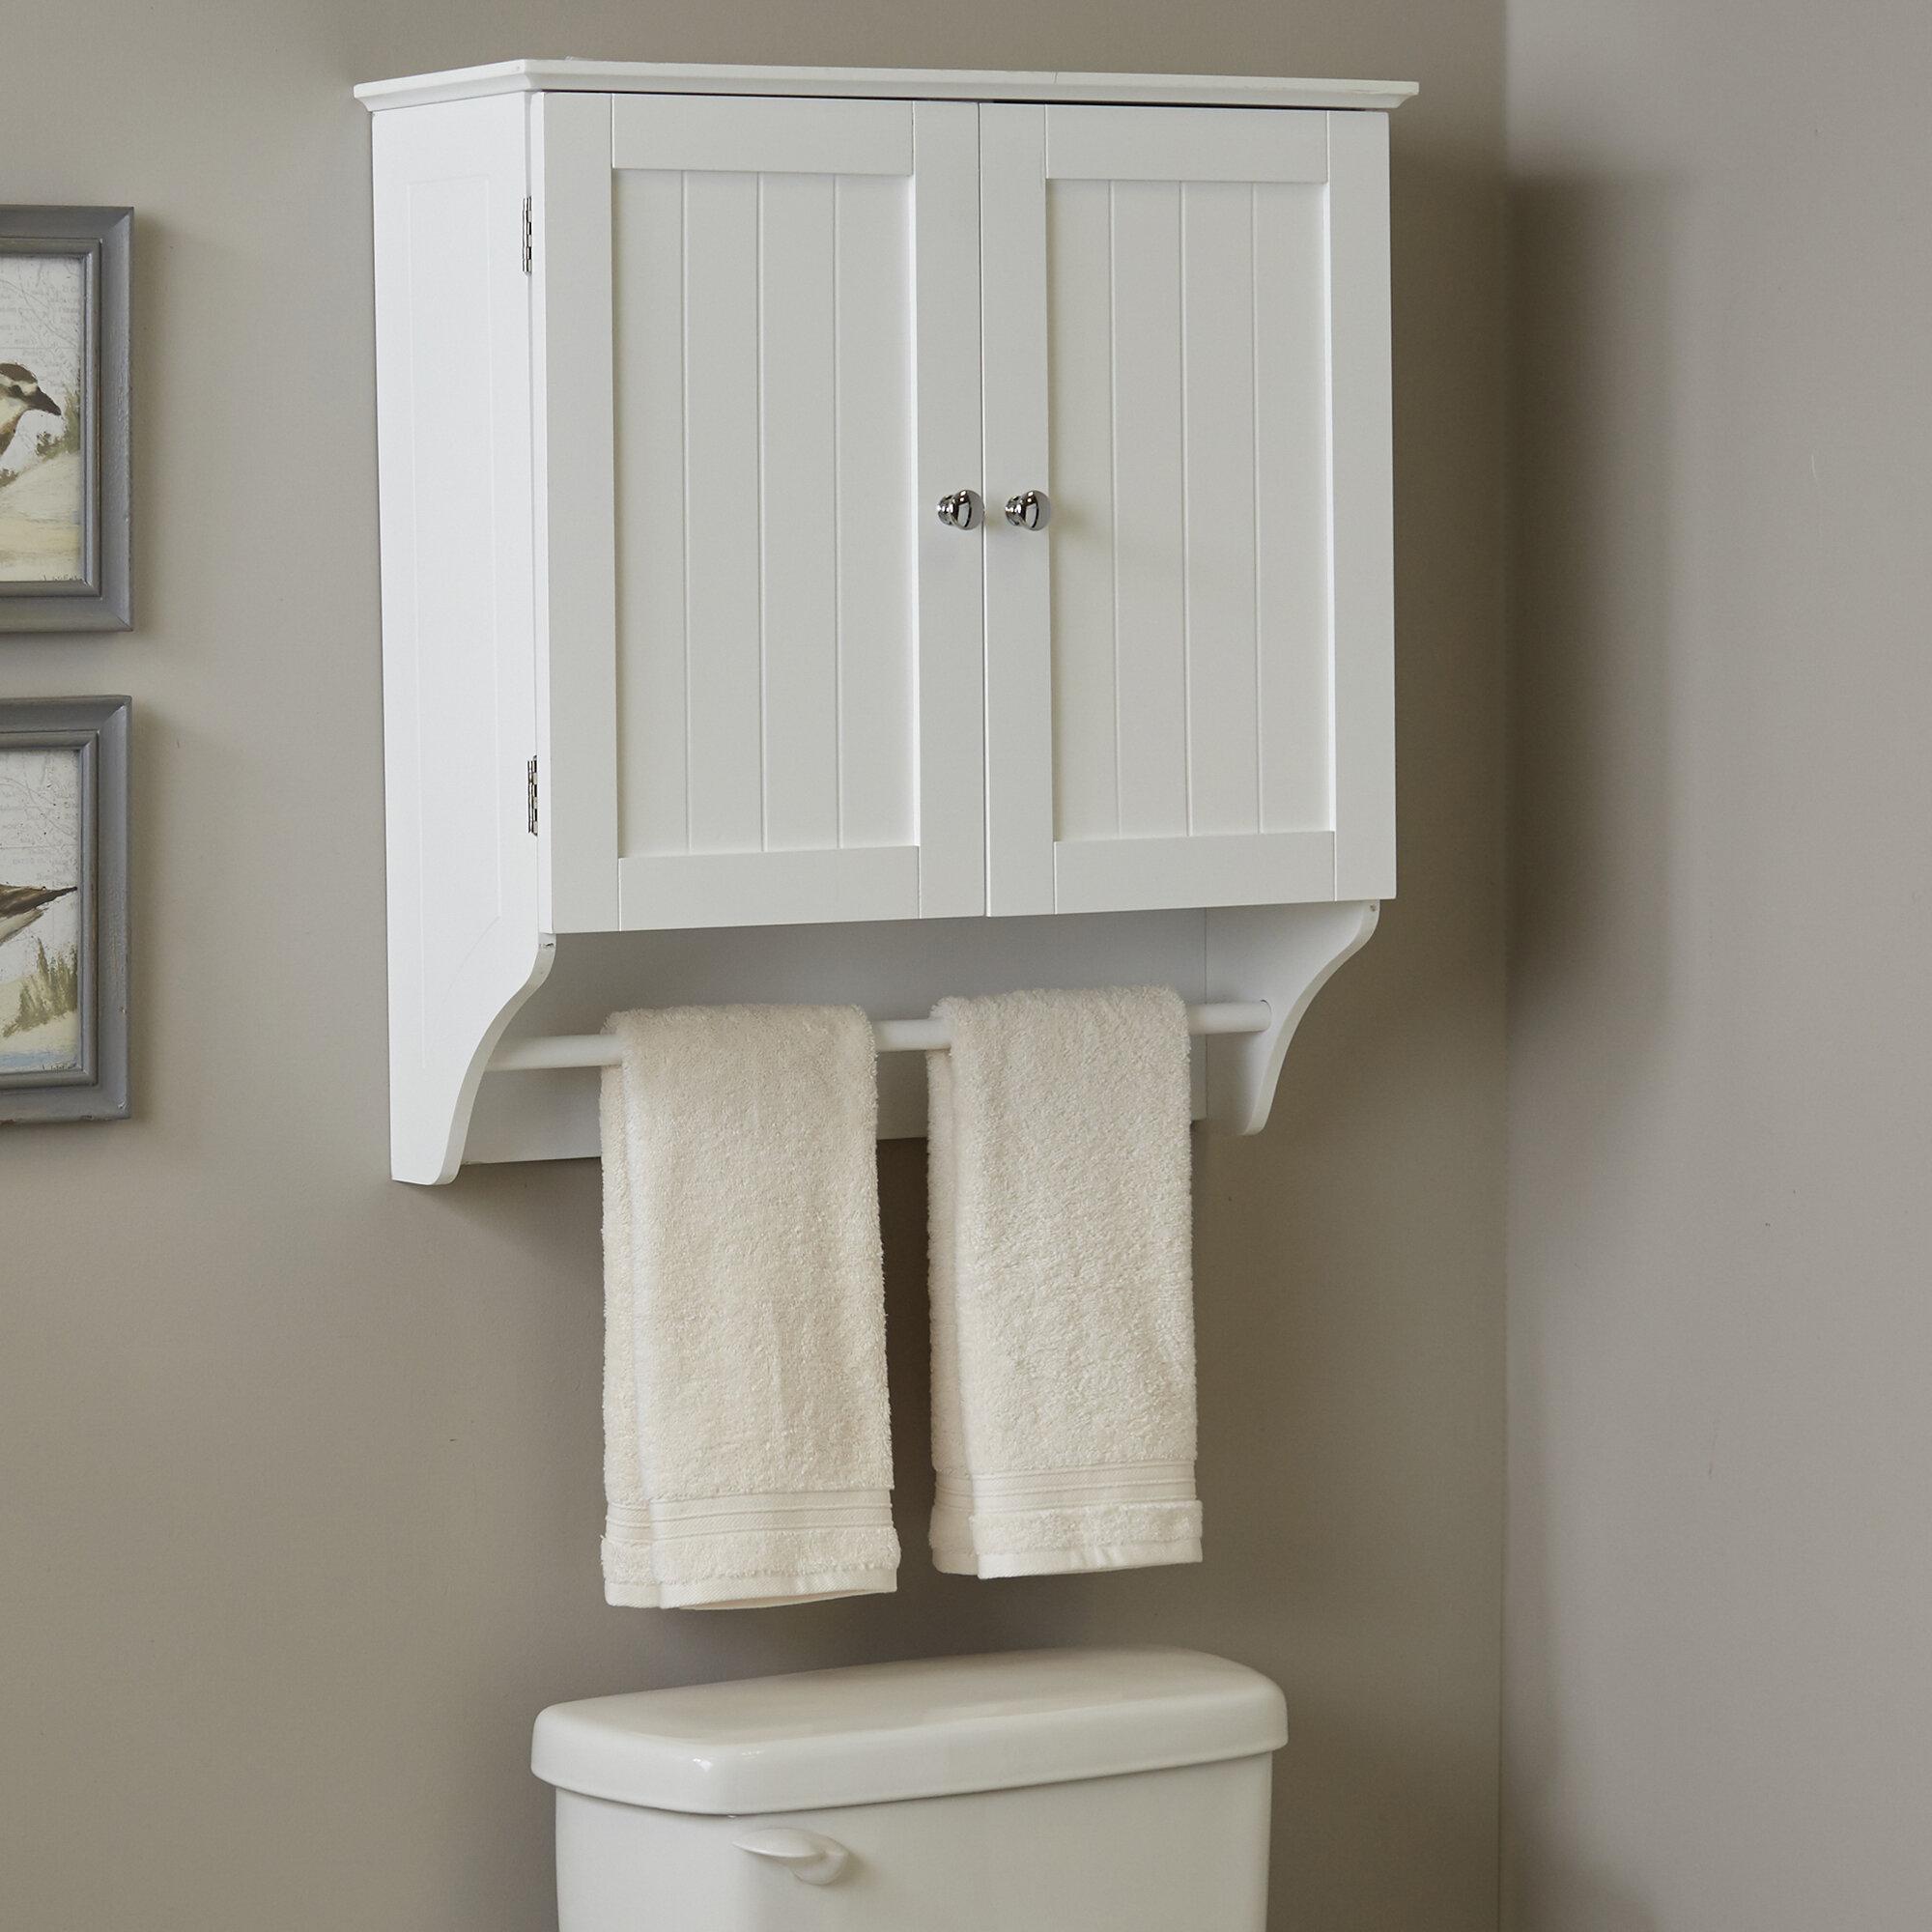 bath wood featuring cabinet mirror pittsburgh cabinets vanities sink bathroom pa gallery and vanity custom alder pennsylvania